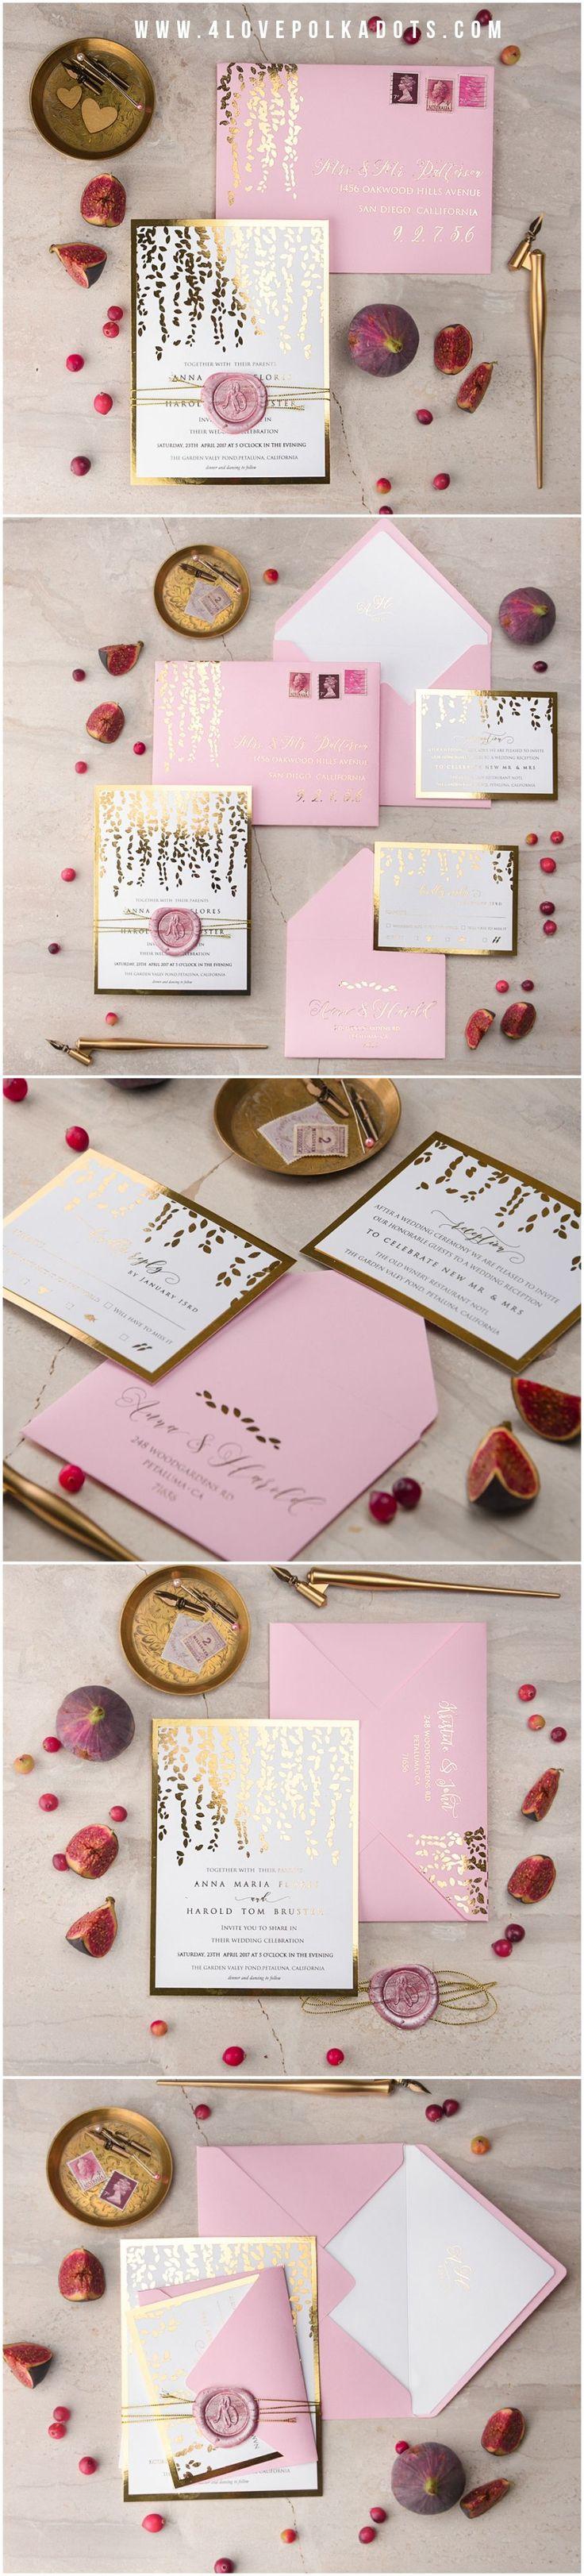 22 best Wedding invitations images on Pinterest